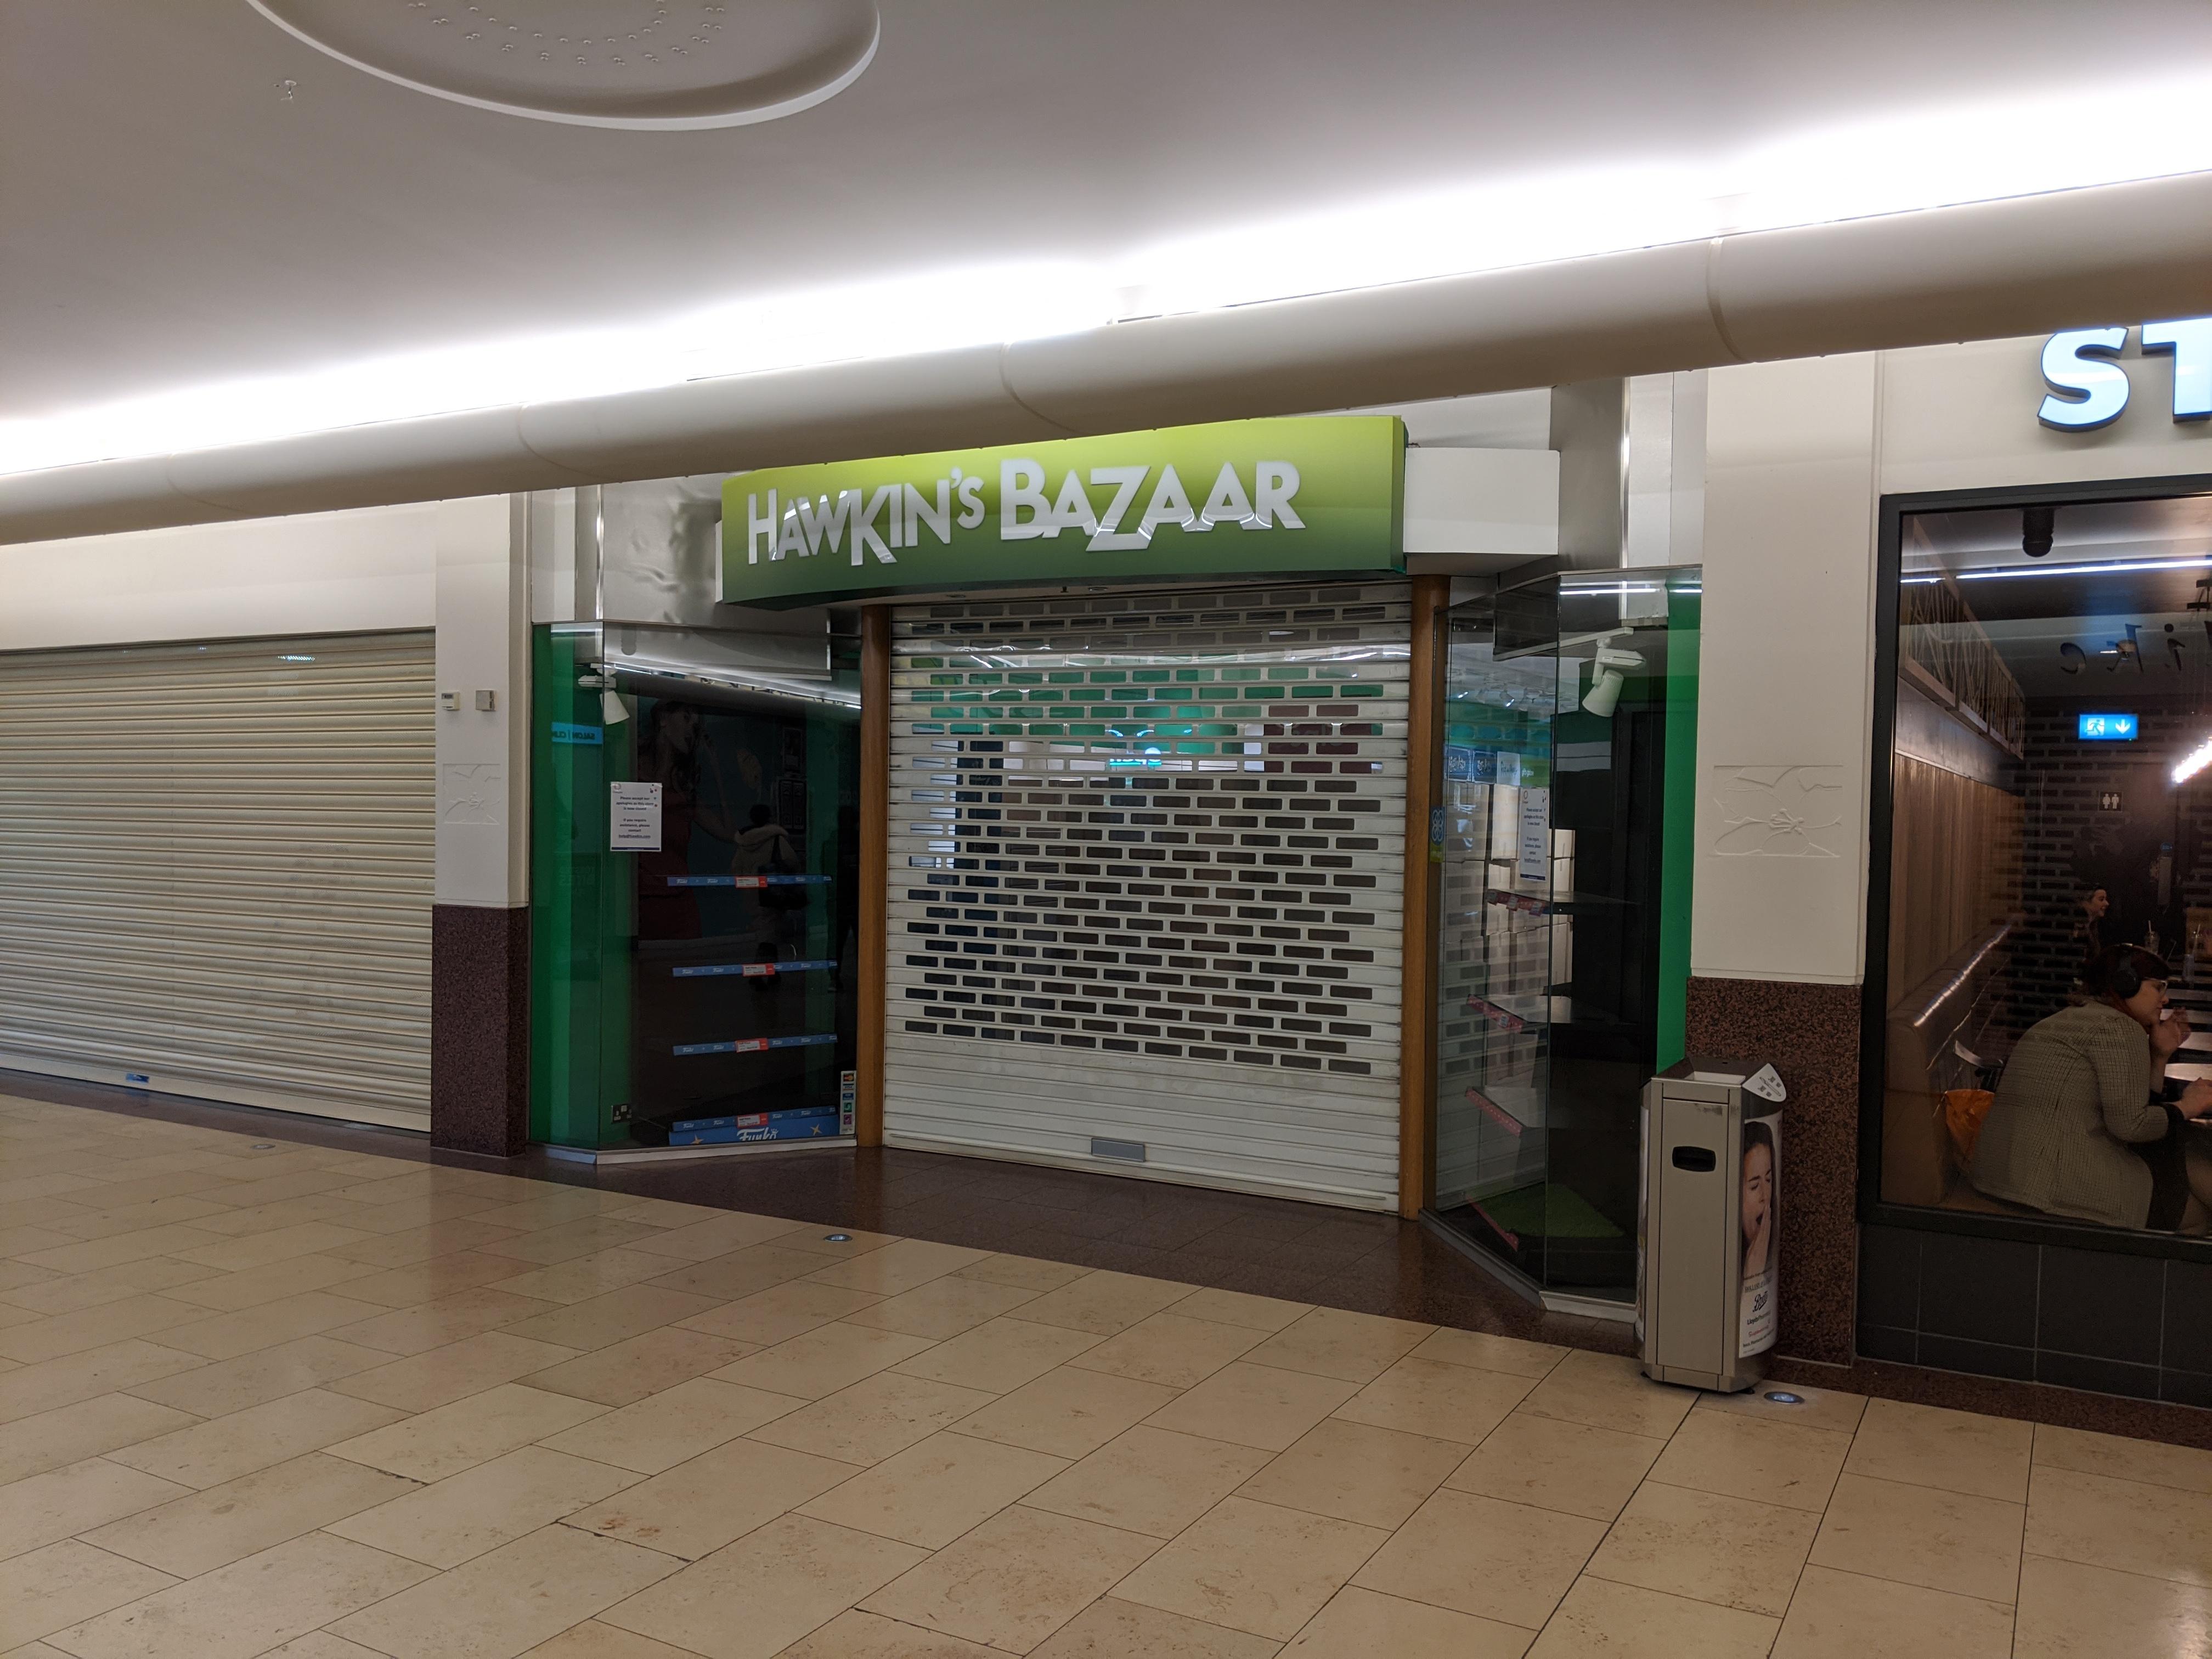 Hawkin's Bazaar, Overgate.